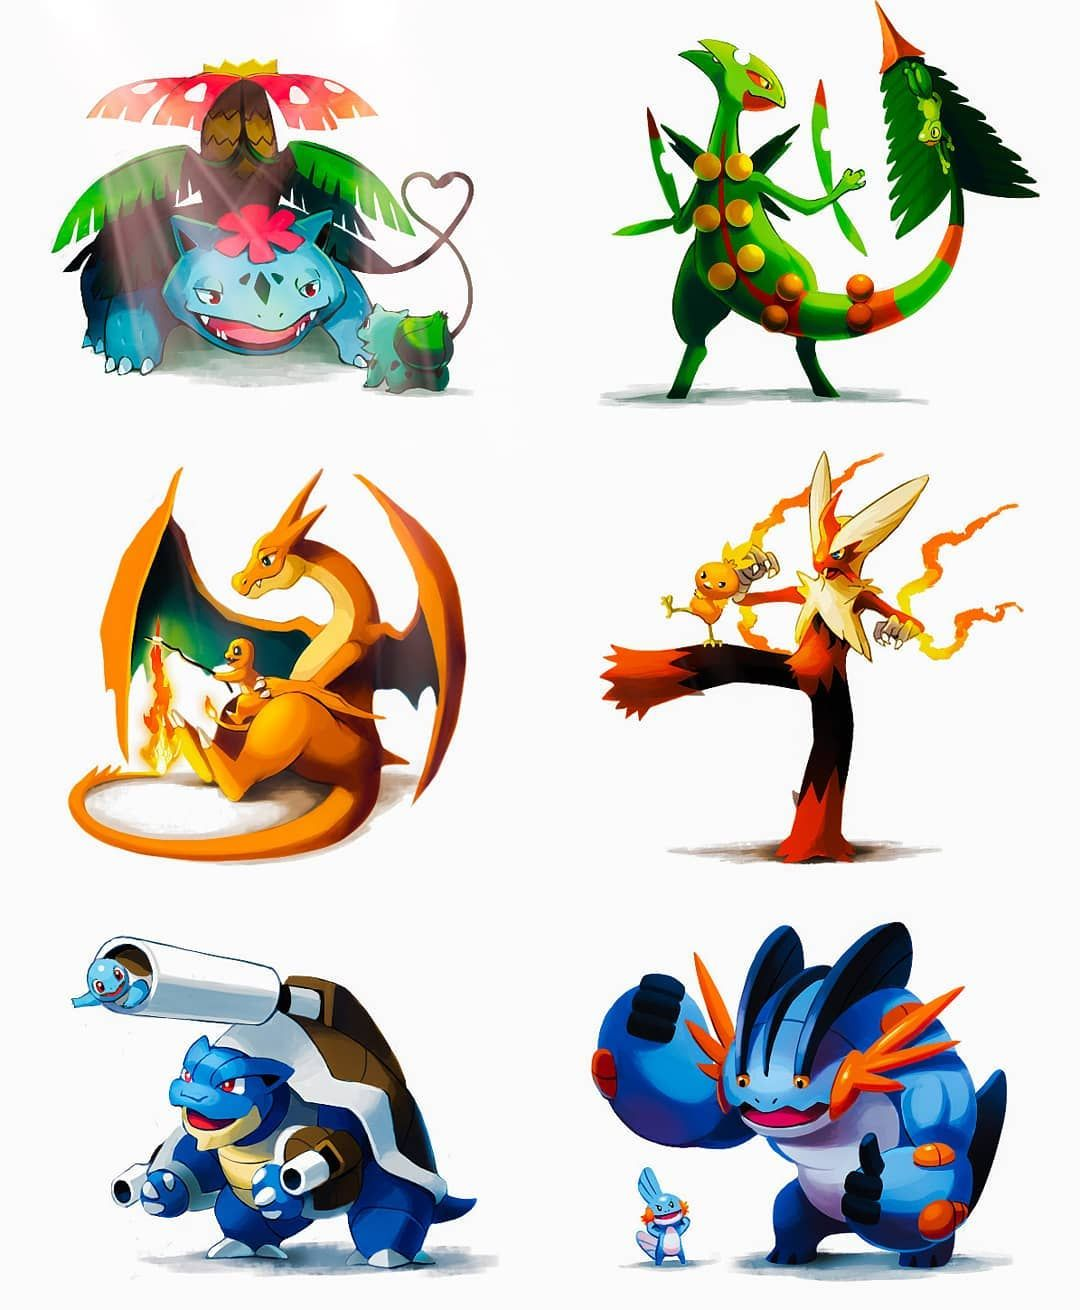 Pokemon Pokemon Pokemonart Thepokemoncompany Pokemon Desenho Pokemon Pokemon Legal